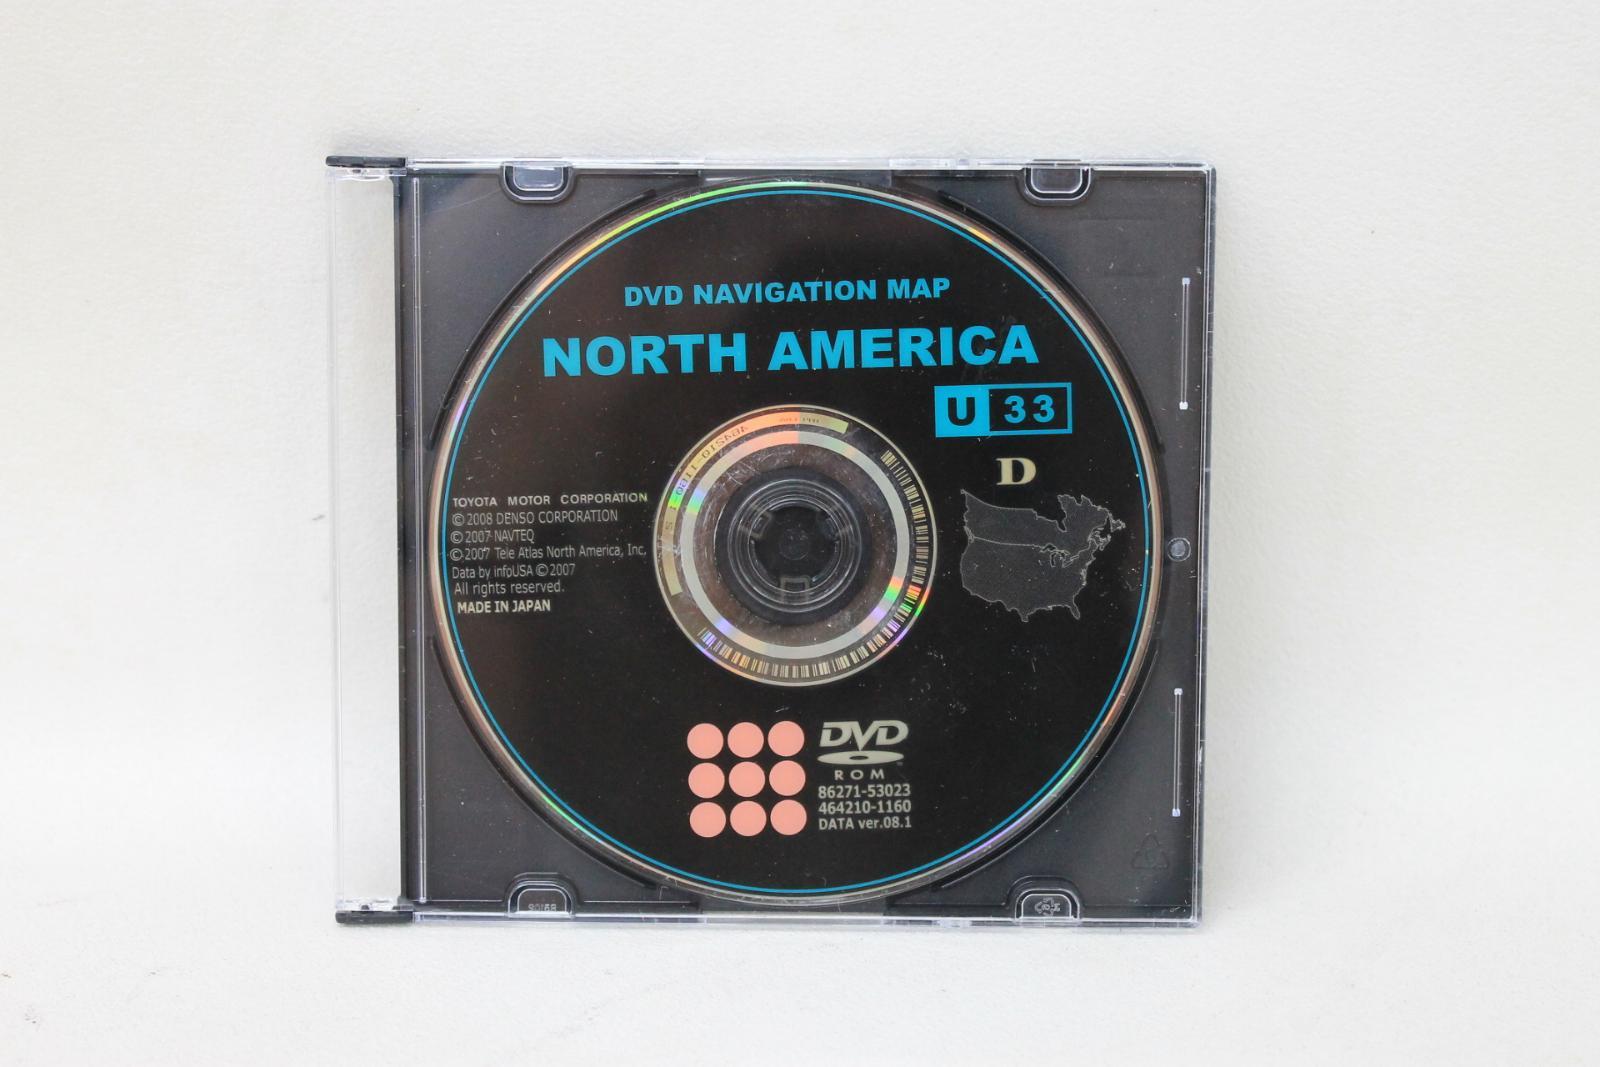 TOYOTA-MOTOR-CORPORATION-North-America-U33-D-Navigation-Map-DVD-Data-Ver-08-1 miniatuur 2